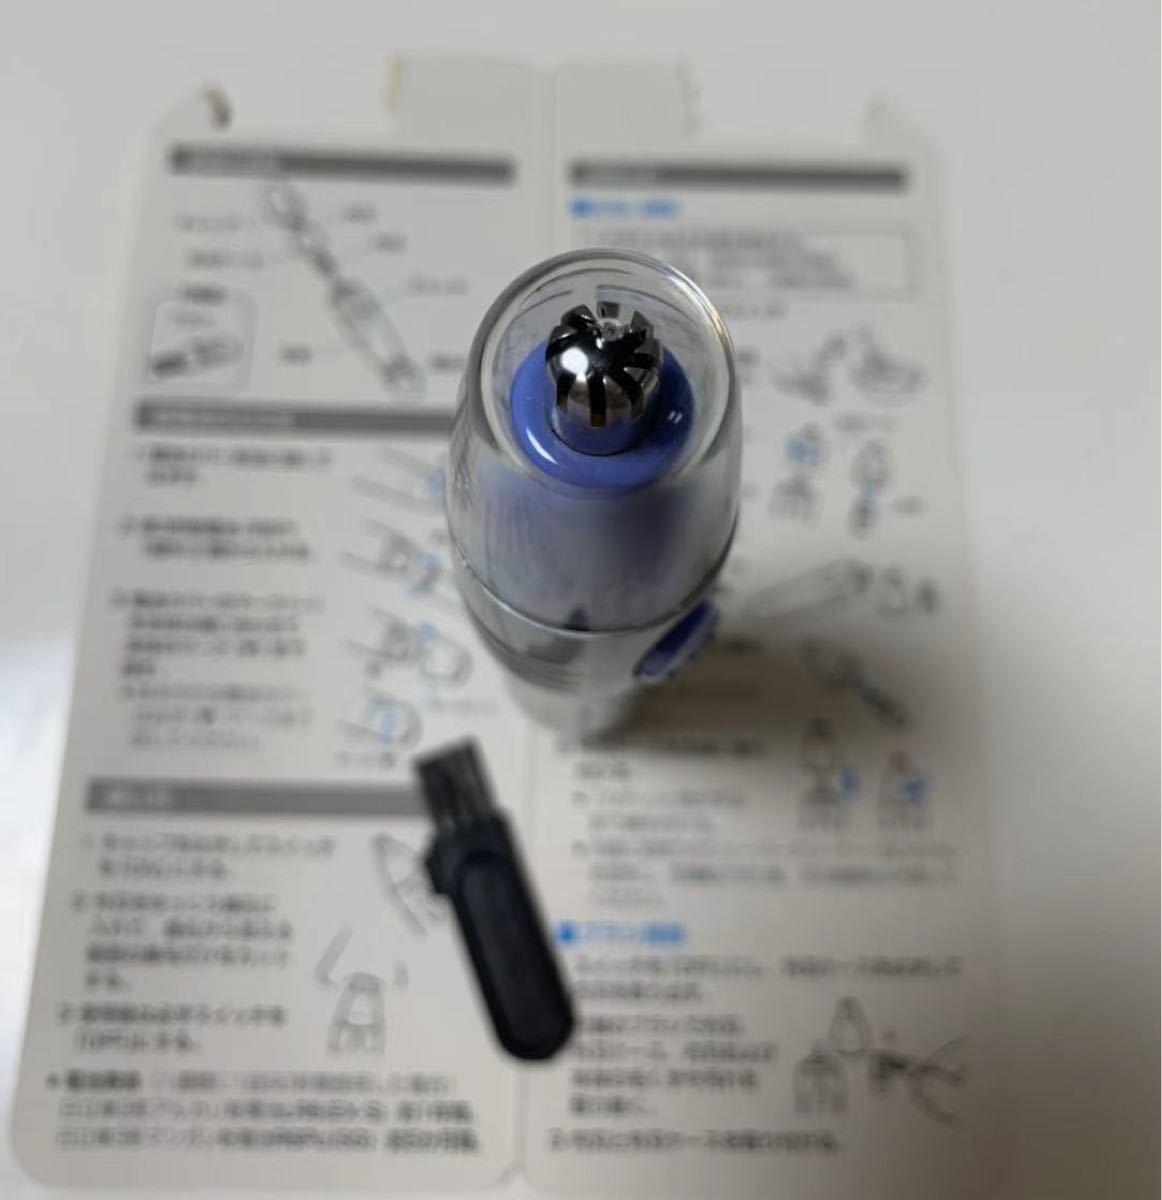 HITACHI 鼻毛カッター BM-03 S  水洗い可能